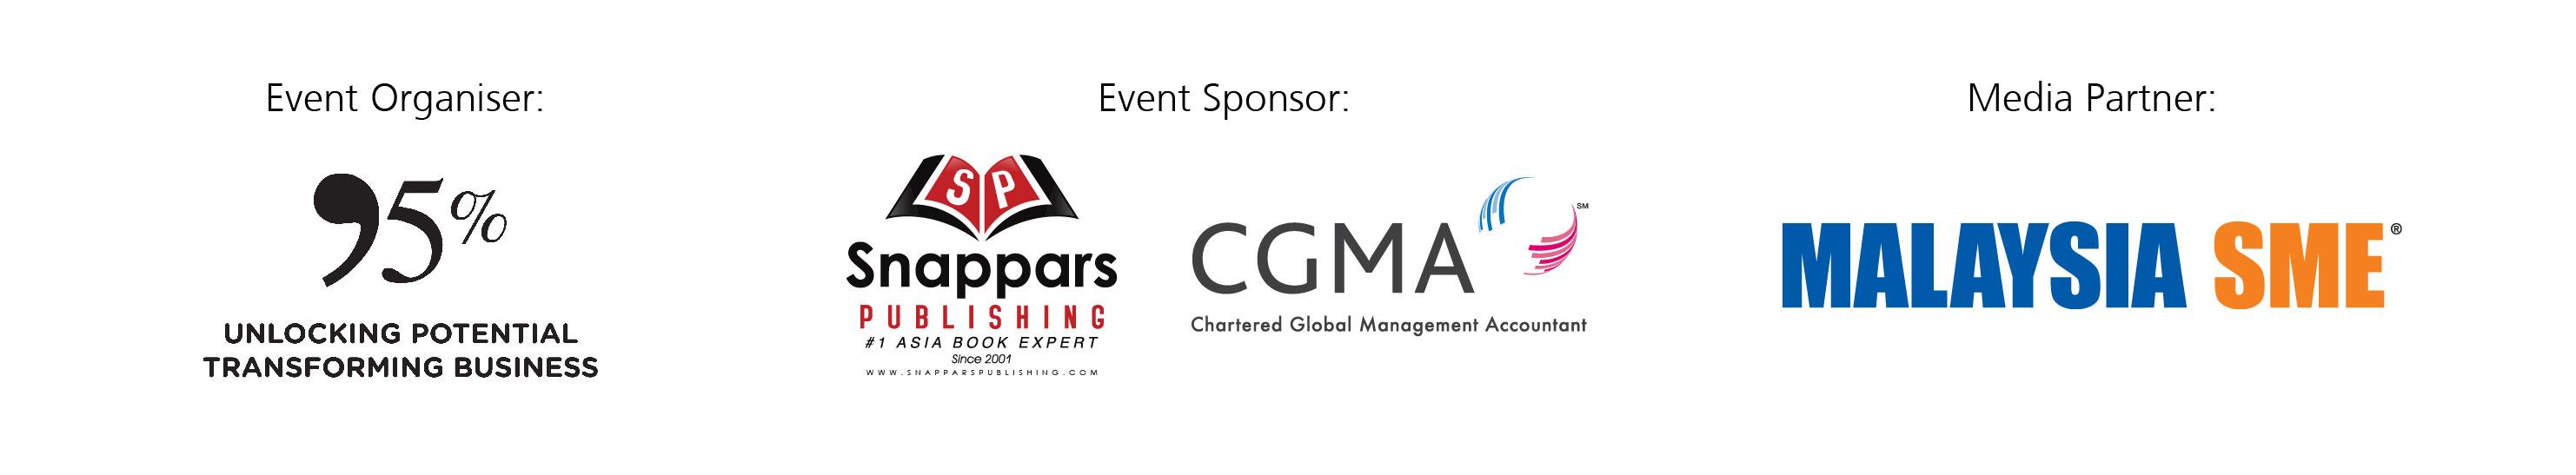 Event organisers logos